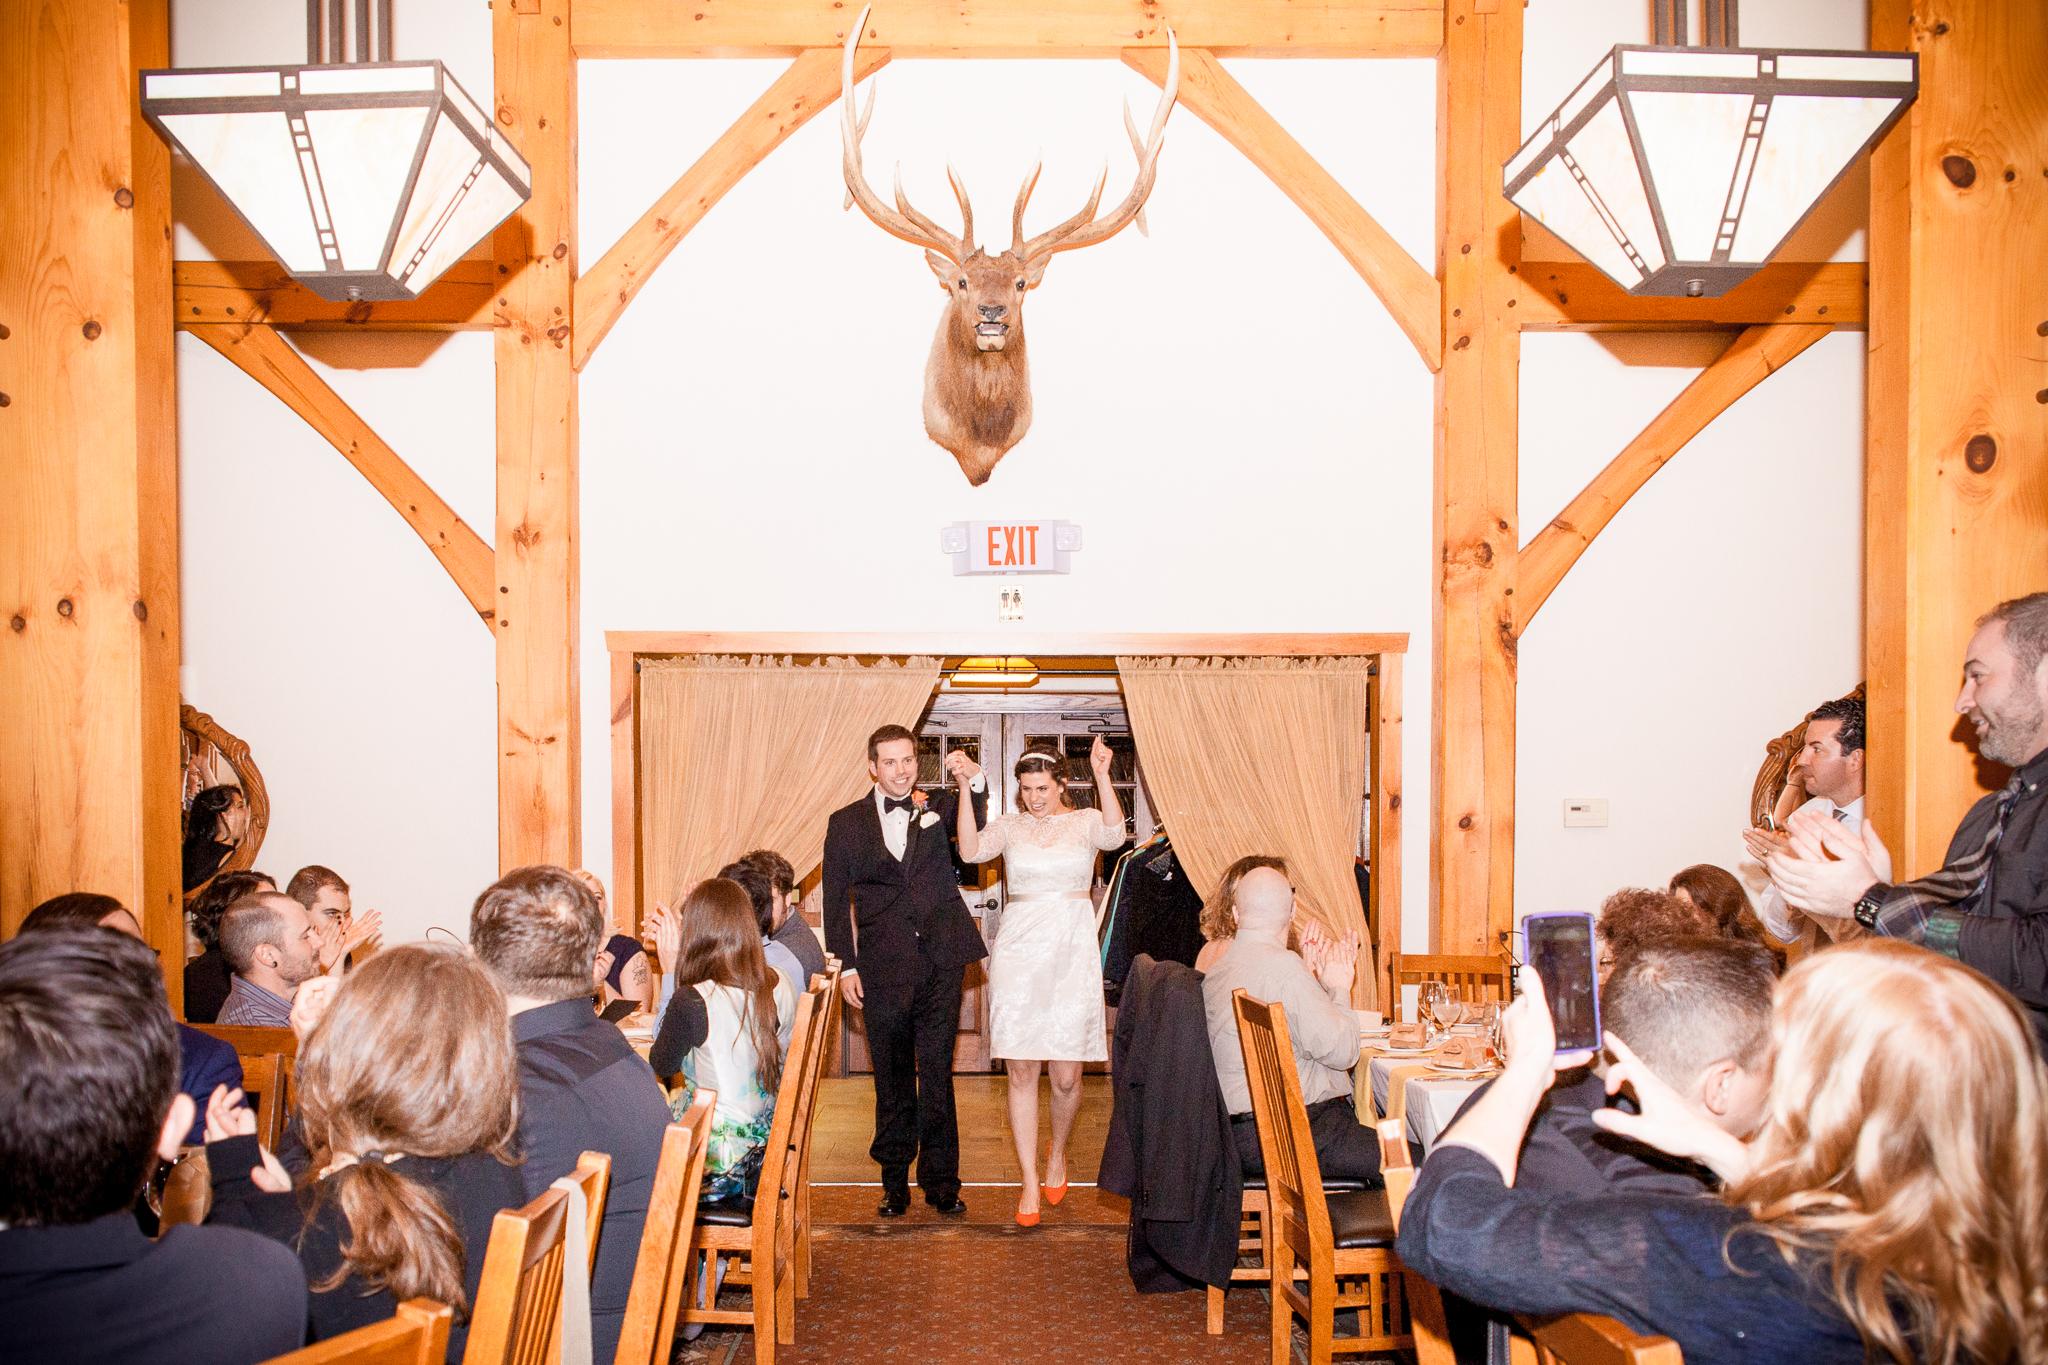 camuglia-whomstudio-chelsea_and_andy-nycphotographer-wedding-brooklyn-buffalo-timberlodge-094-0667.jpg